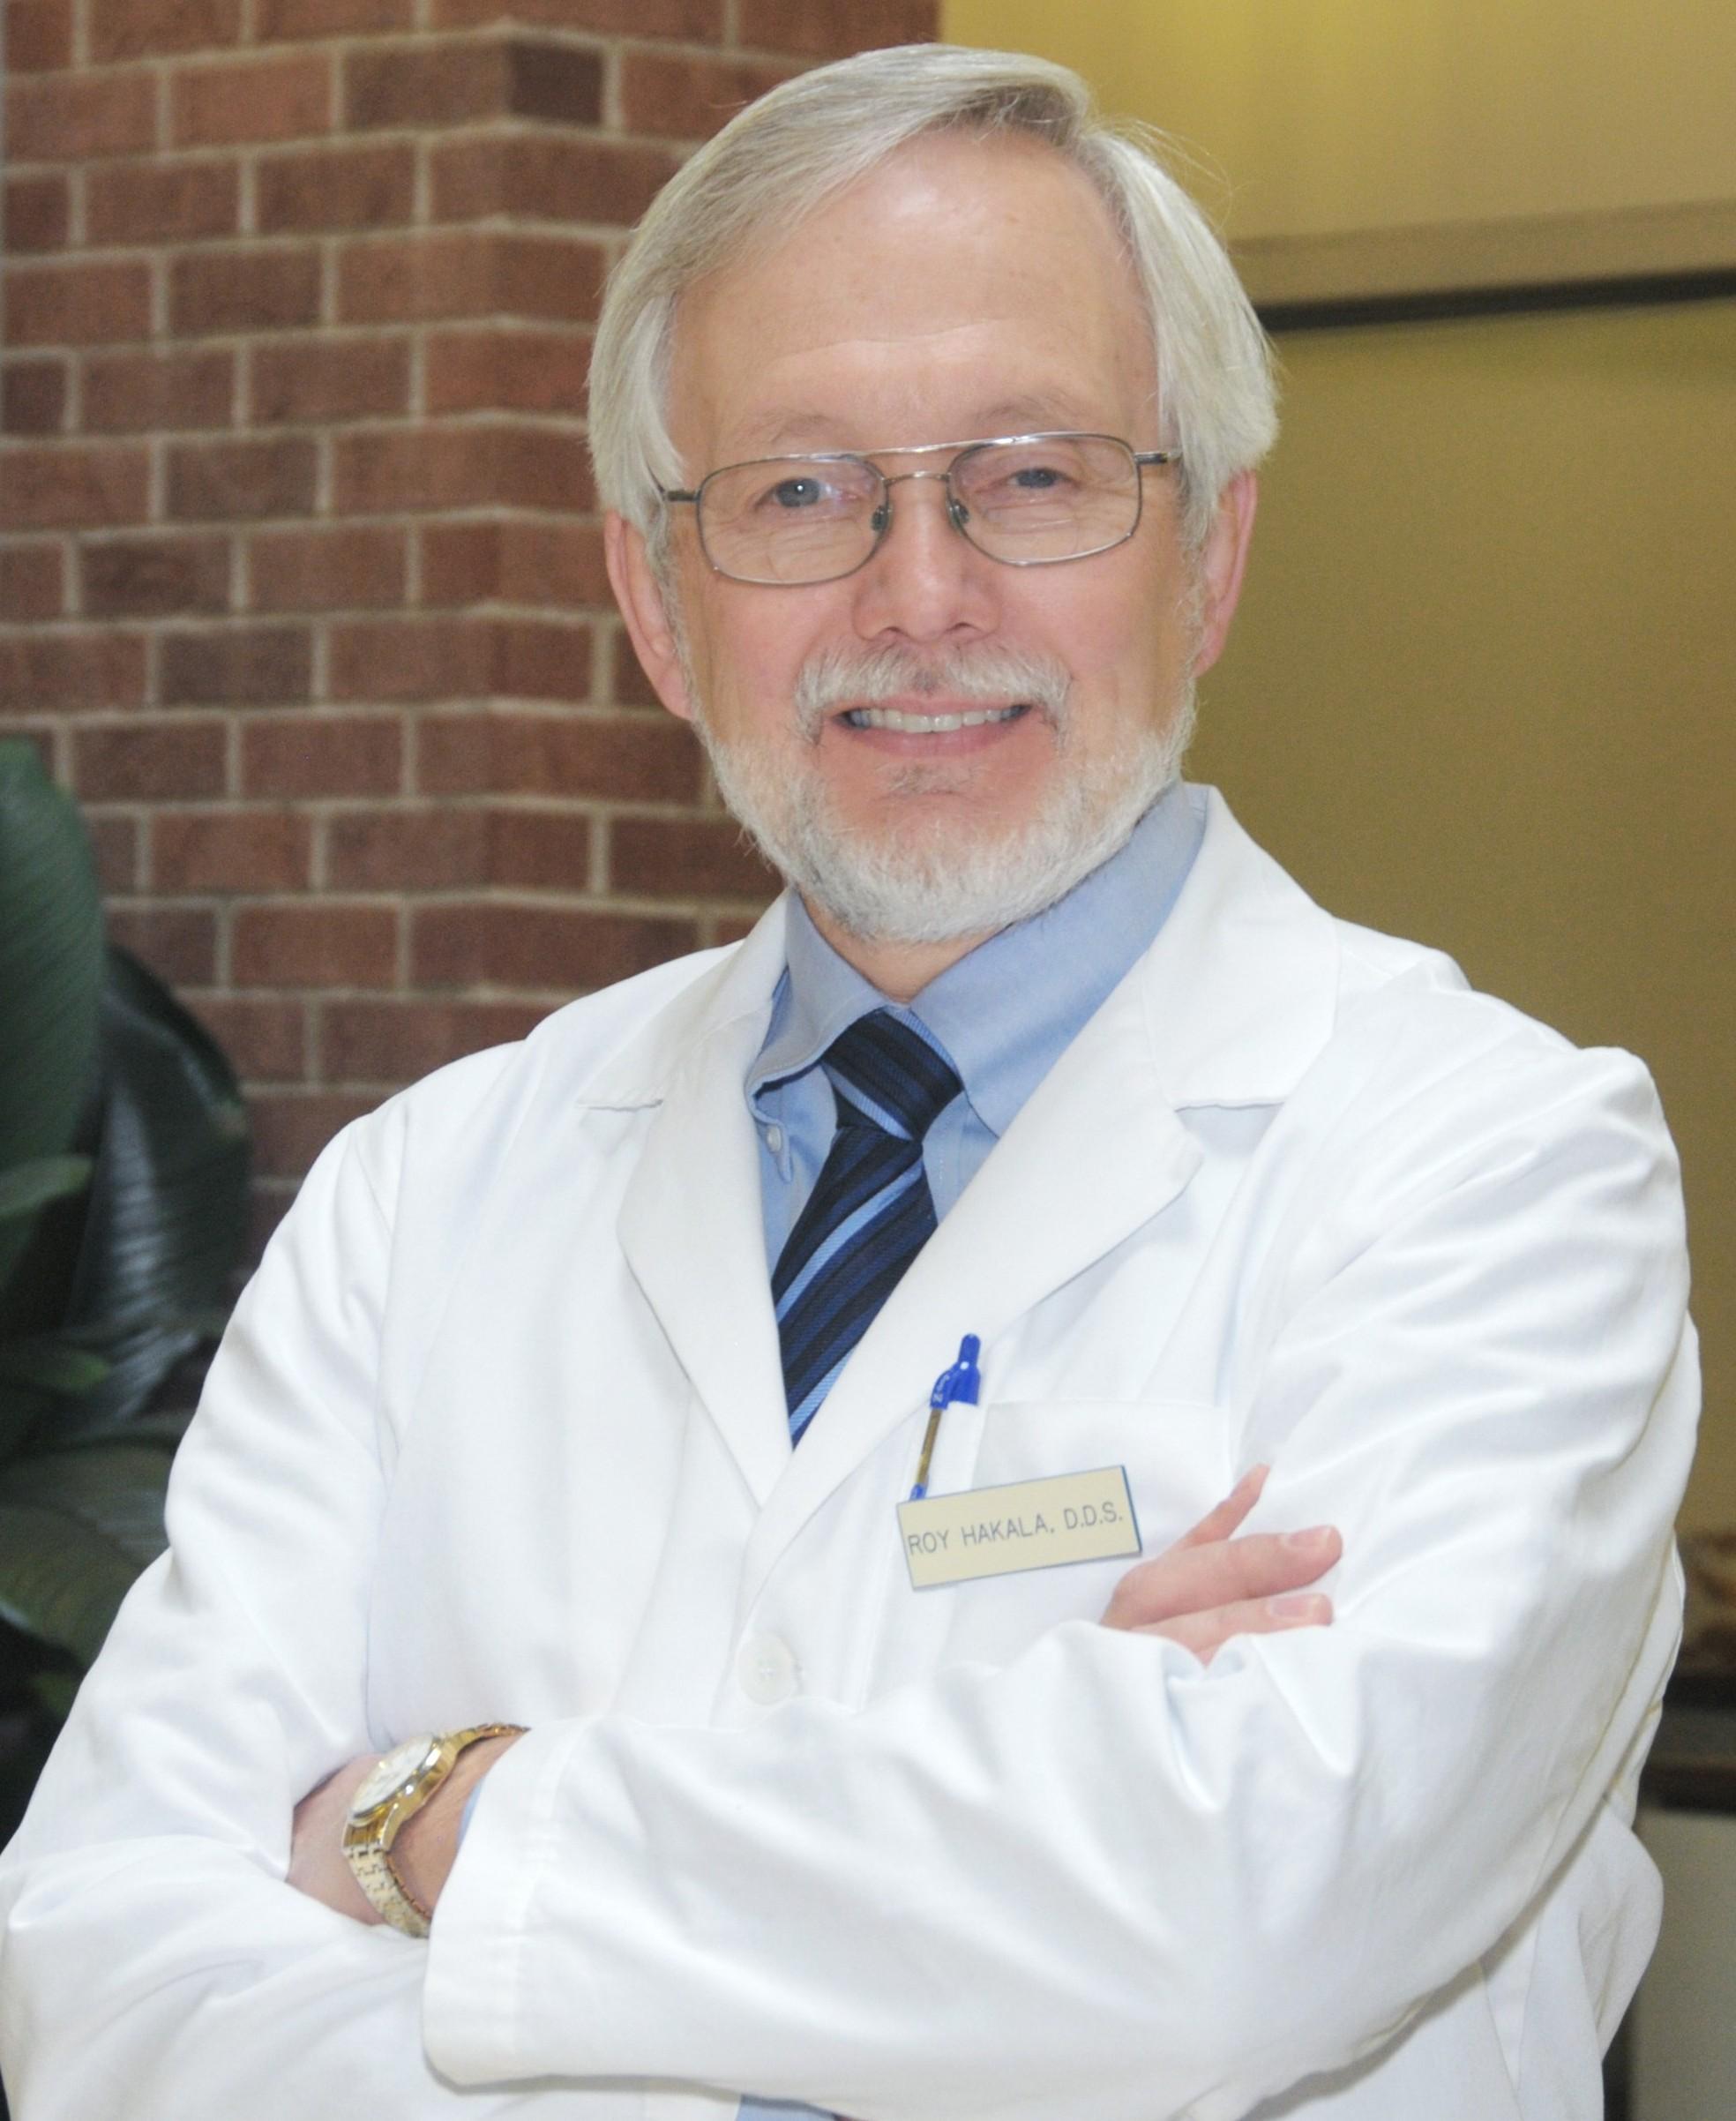 about Dr. Hakala